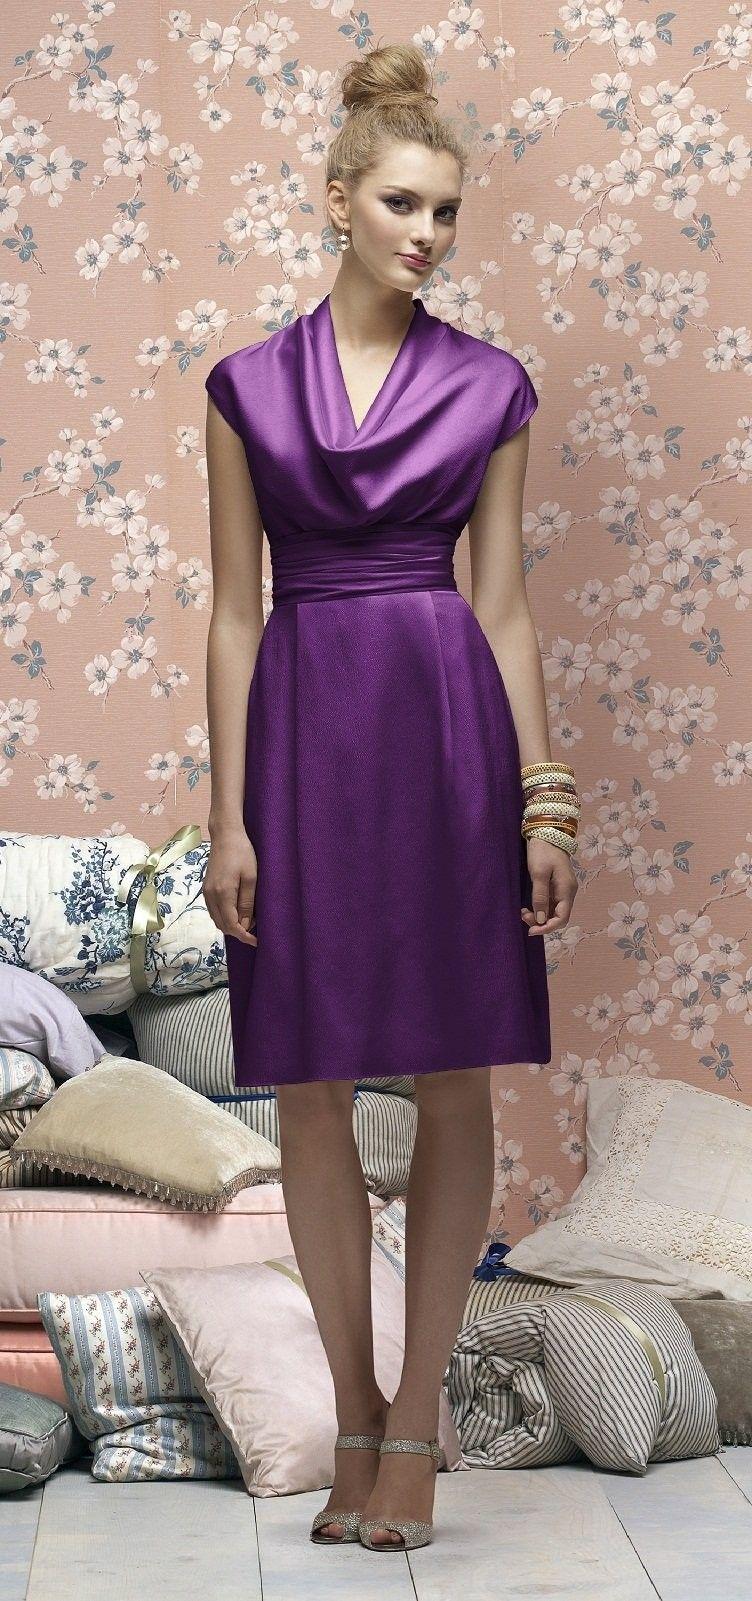 bridesmaid dress by lela rose $276 (african violet) | Wedding Ideas ...